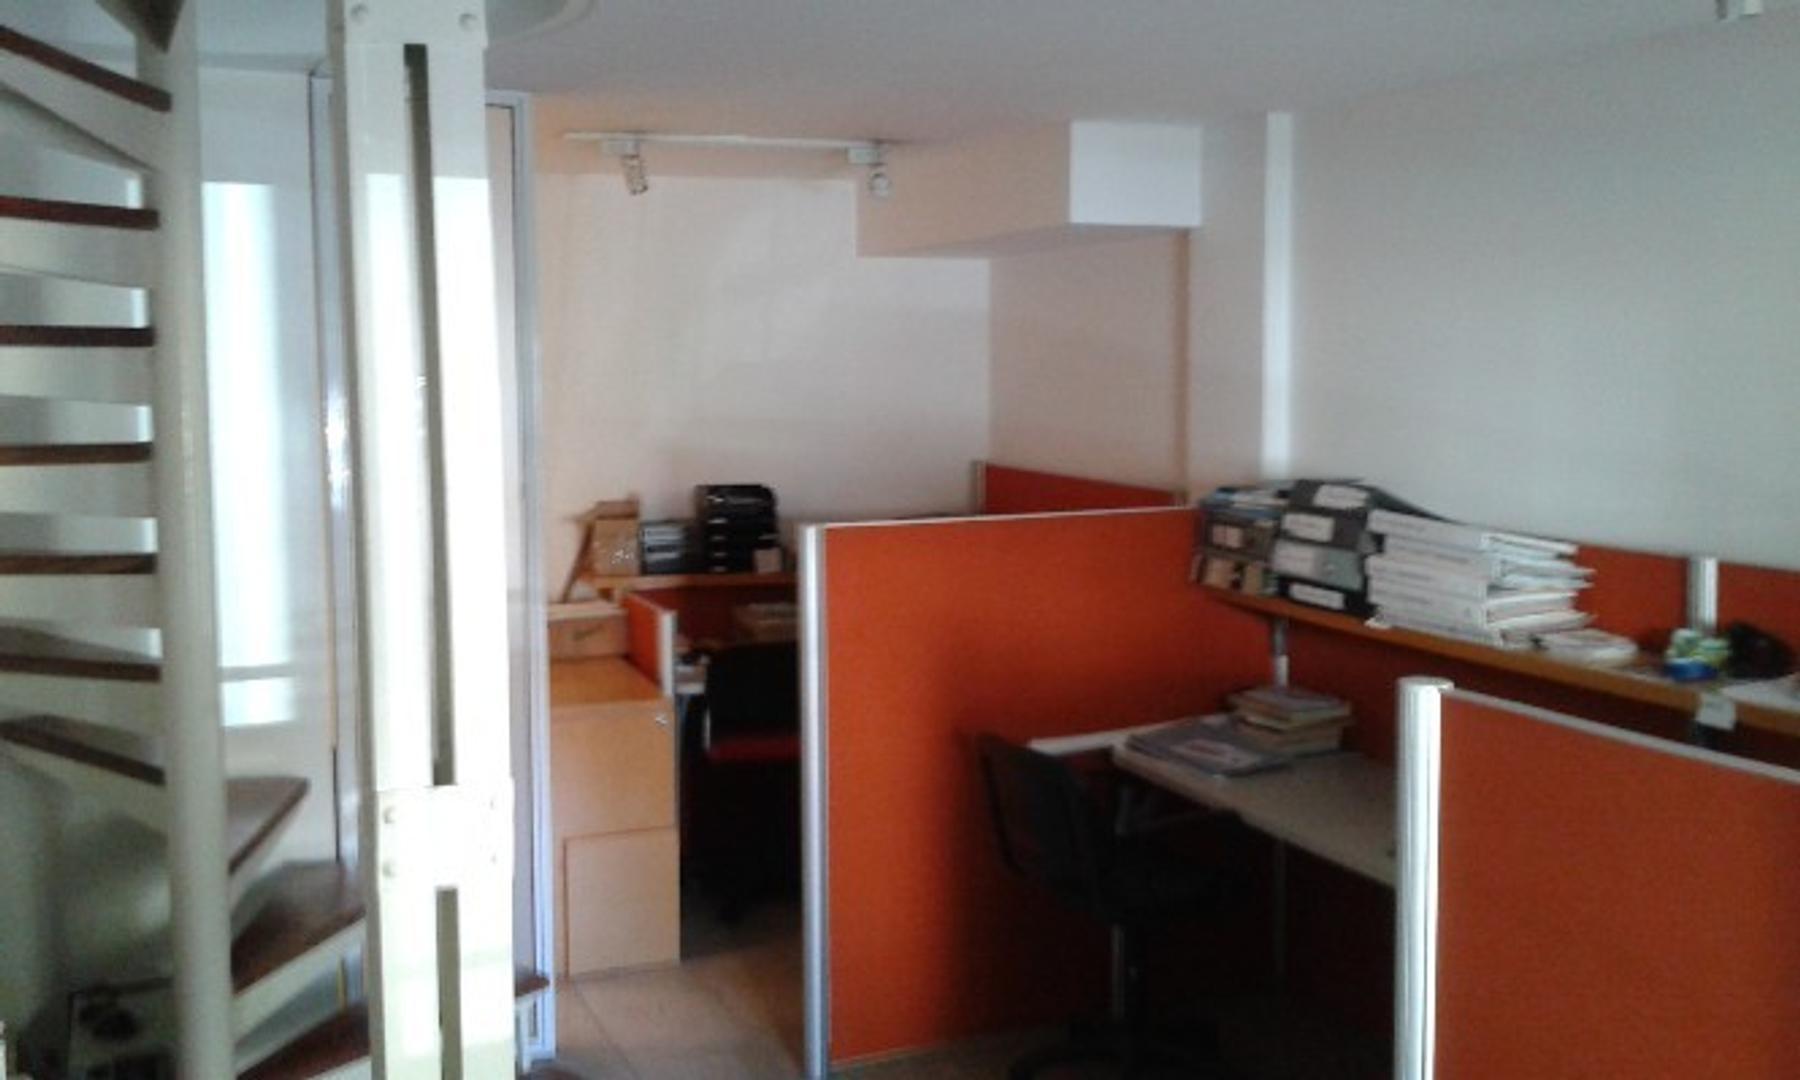 XINTEL(BIL-BIL-341) Departamento - Venta - Argentina, CAPITAL FEDERAL - BONORINO, ESTEBAN, CNEL. 814